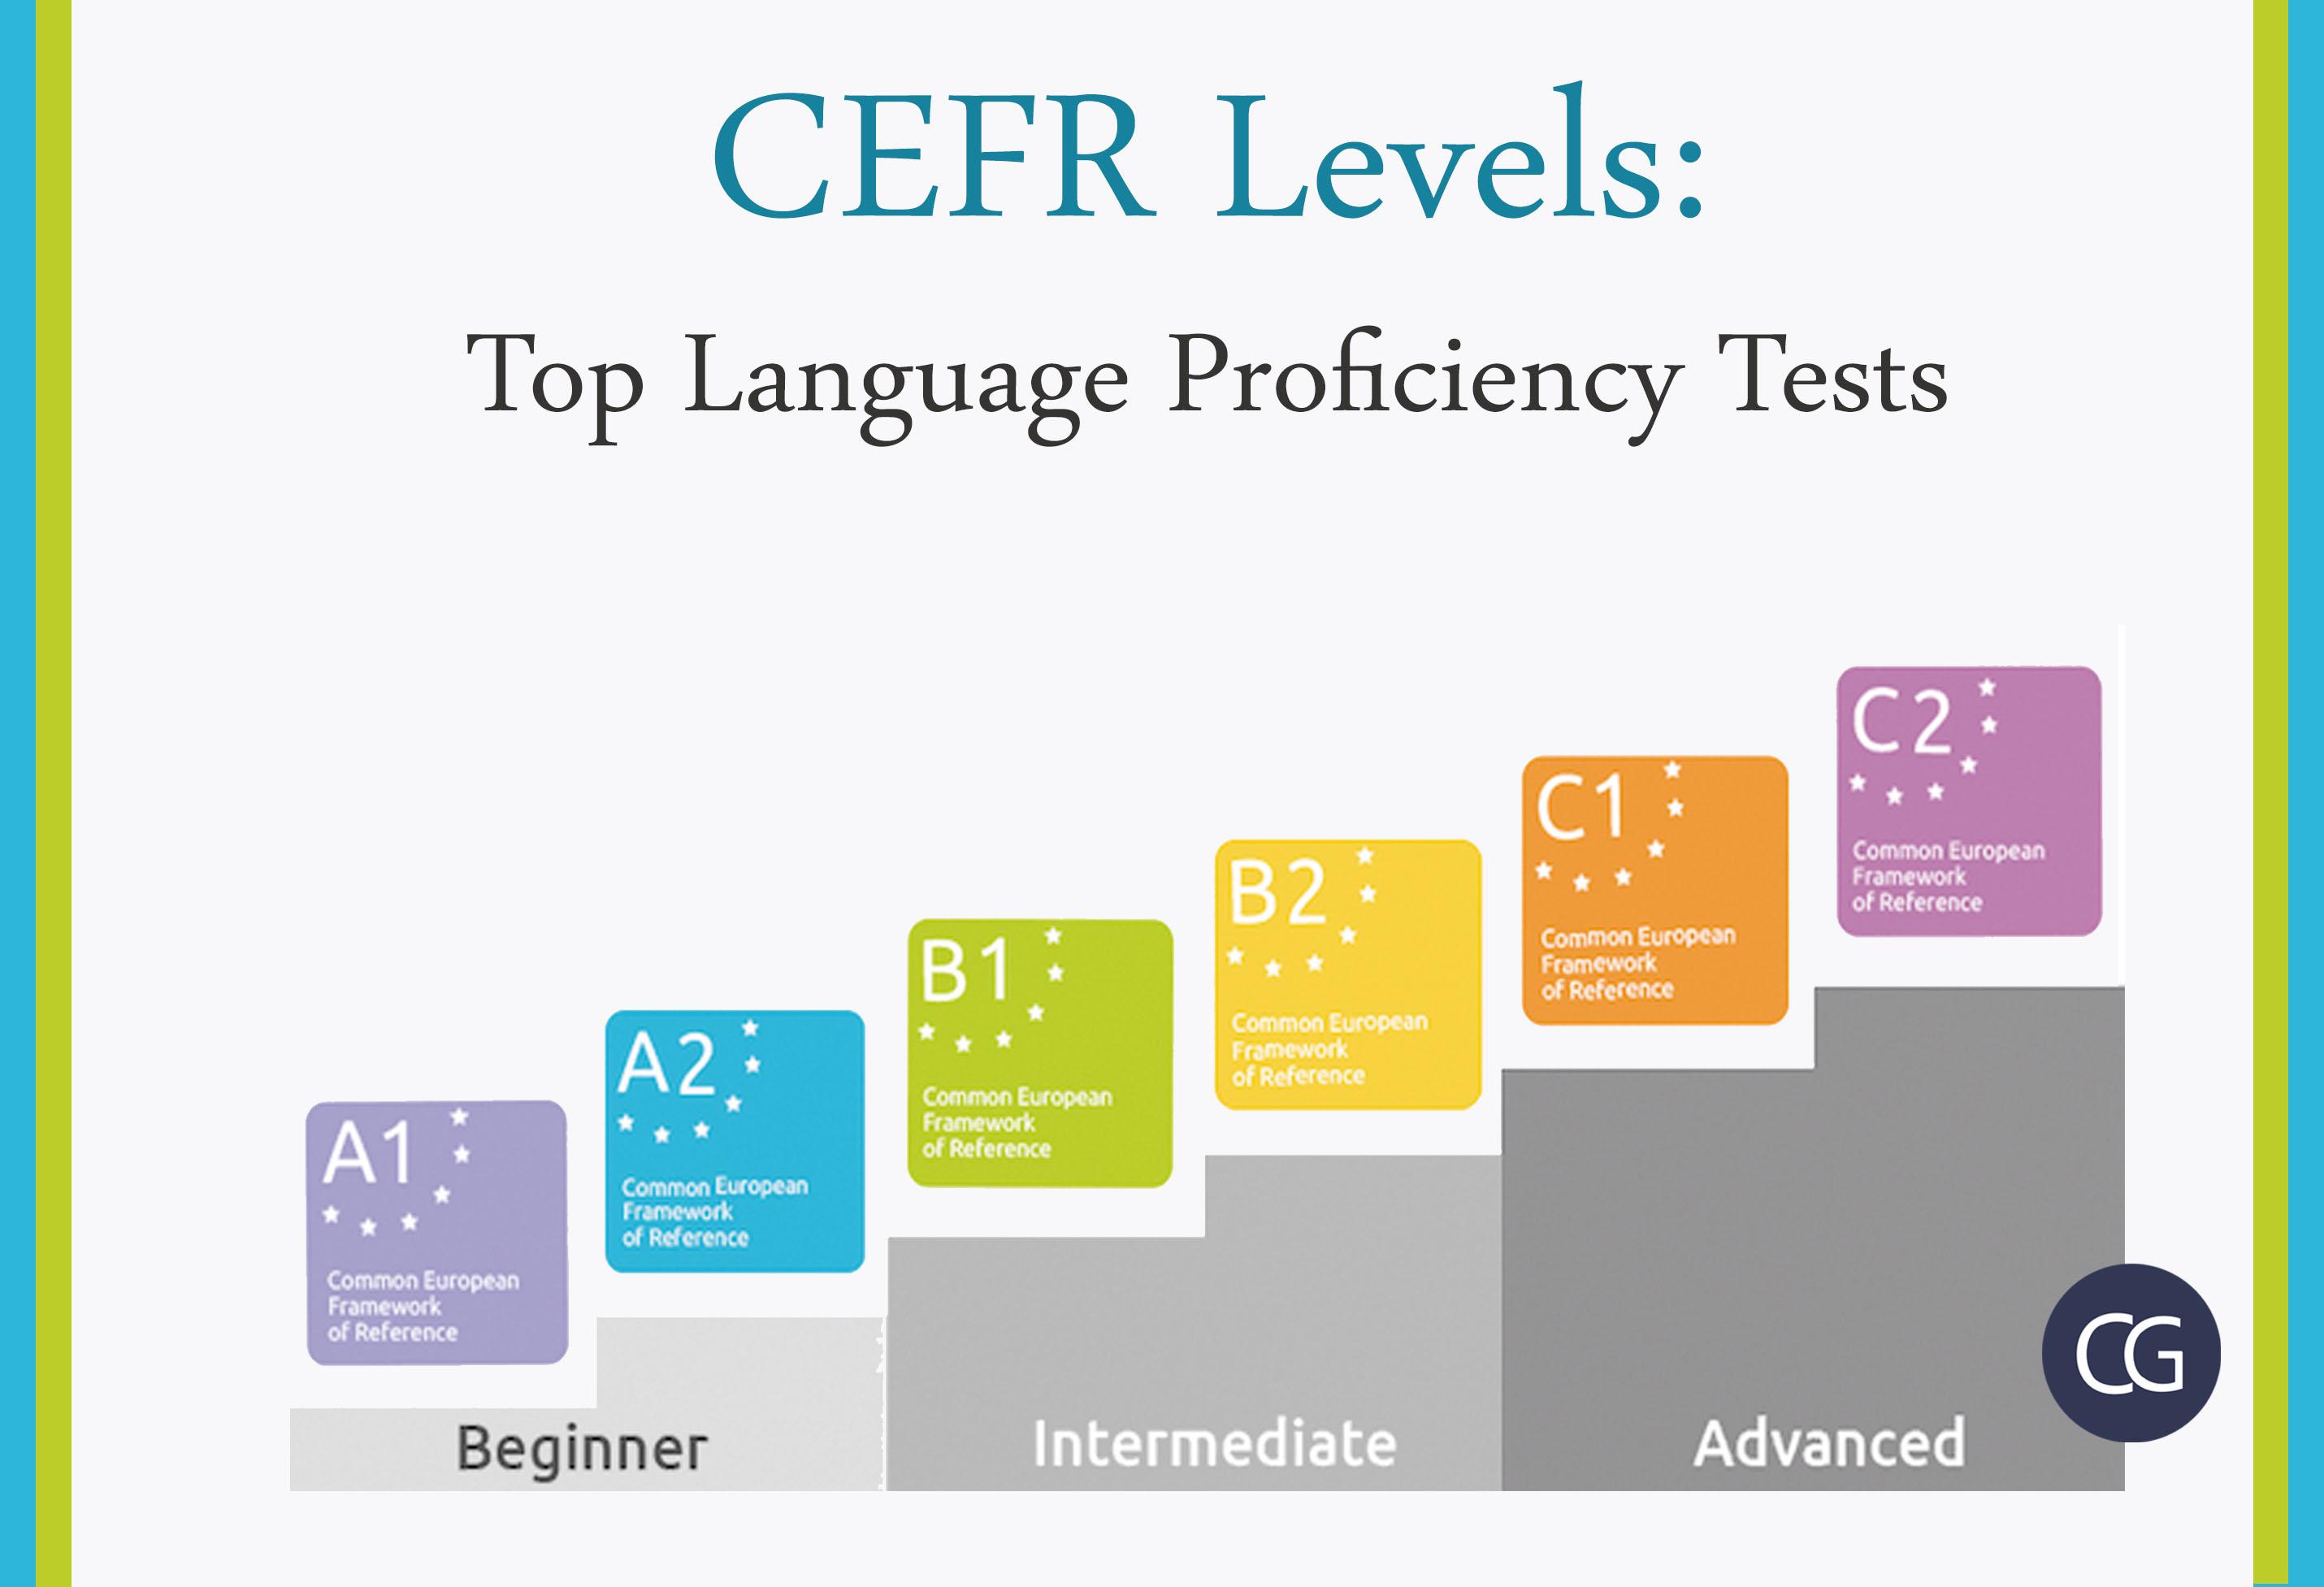 cefr-level-language-proficiency-test